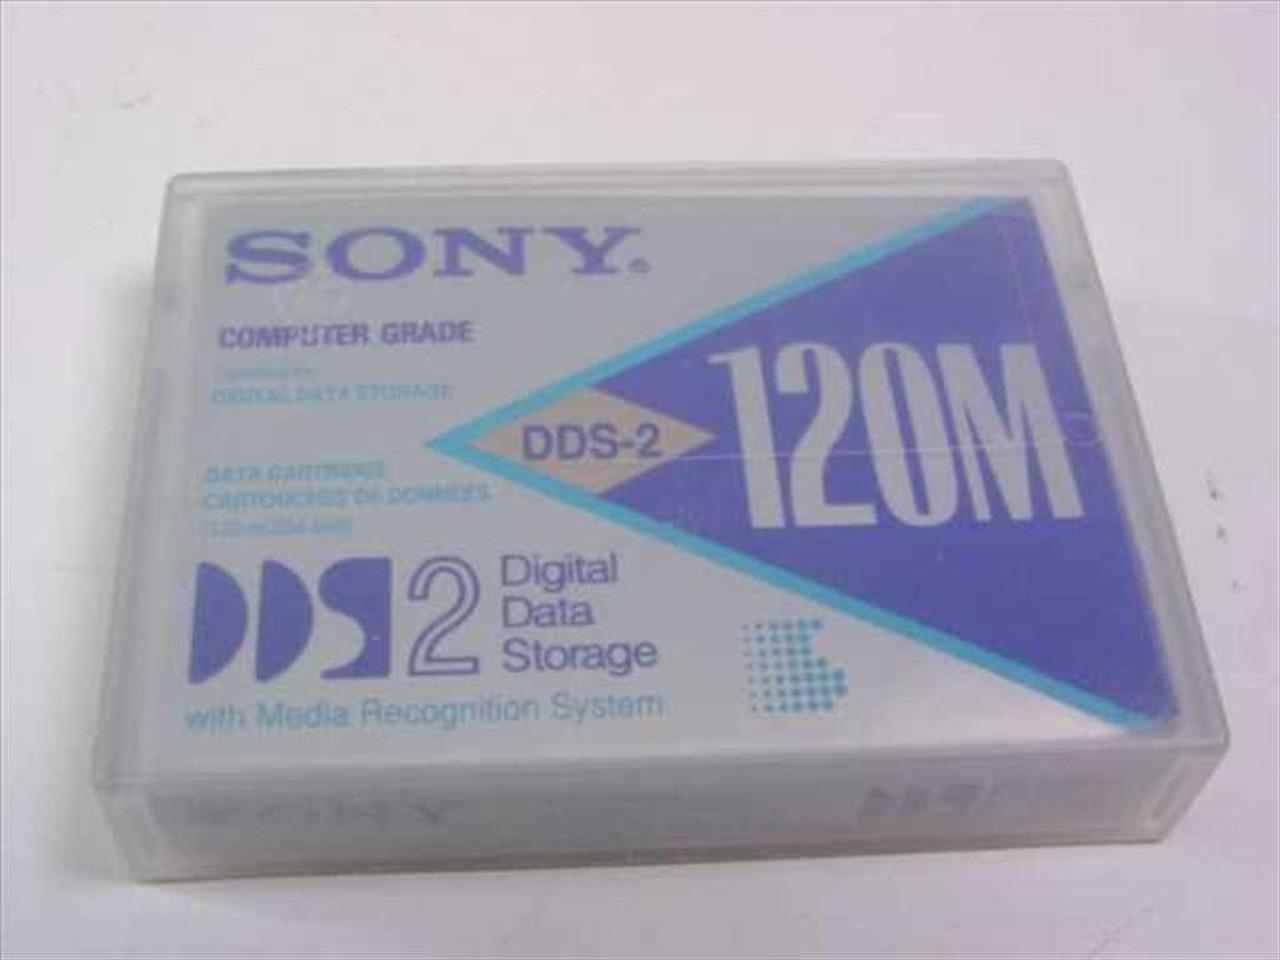 Sony DGD120MA Digital Data Storage DDS 2 Tape Cartridge